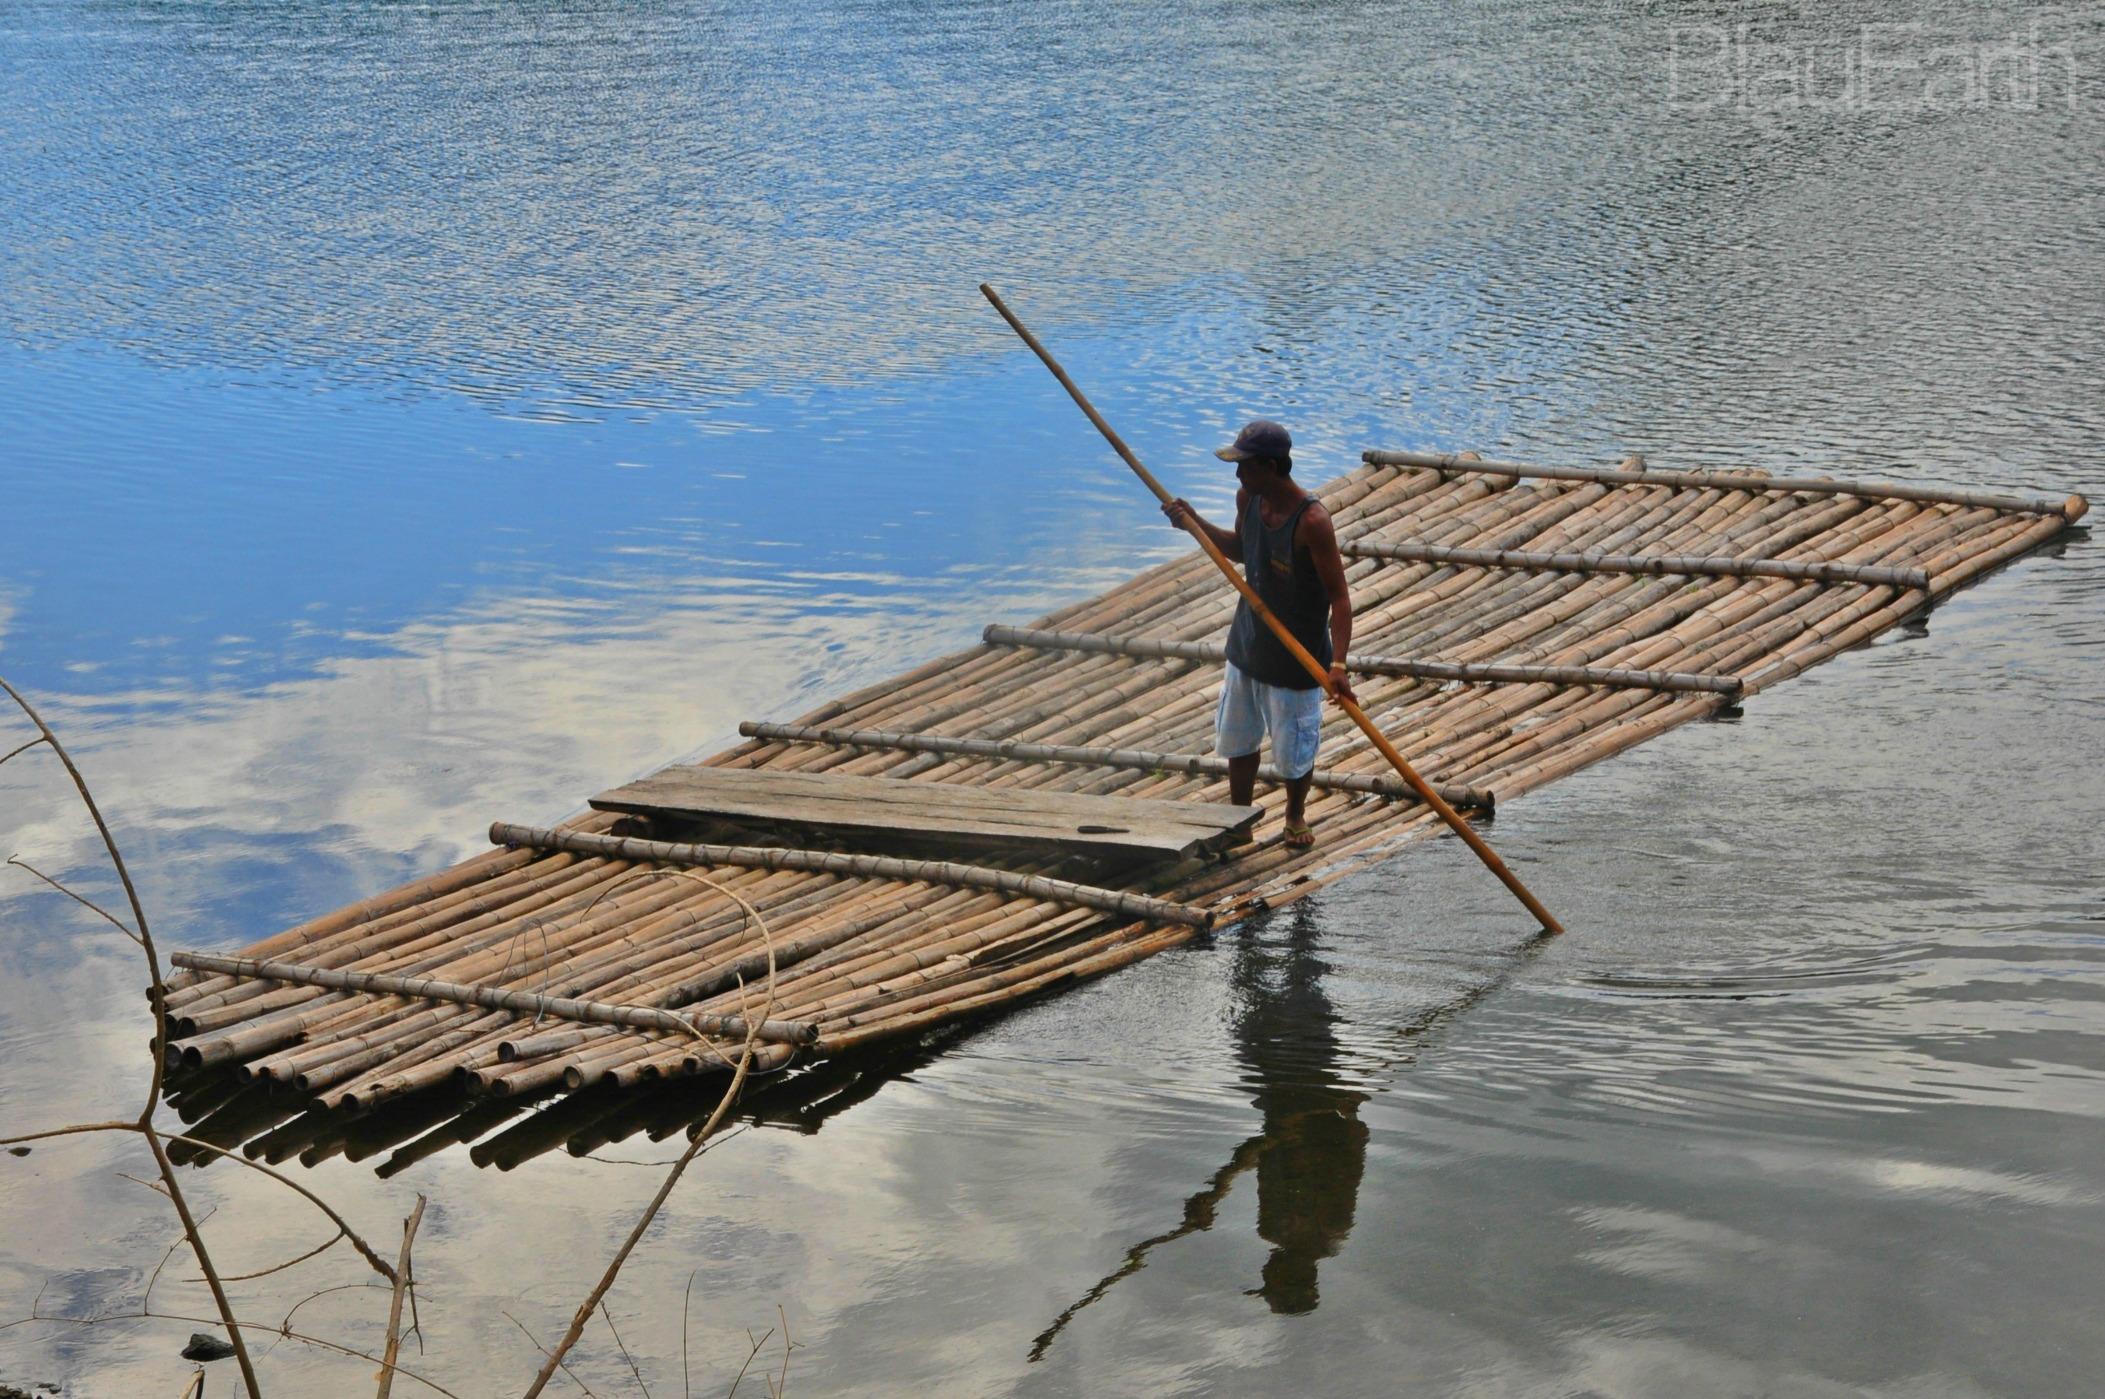 Bislak River, Vintar